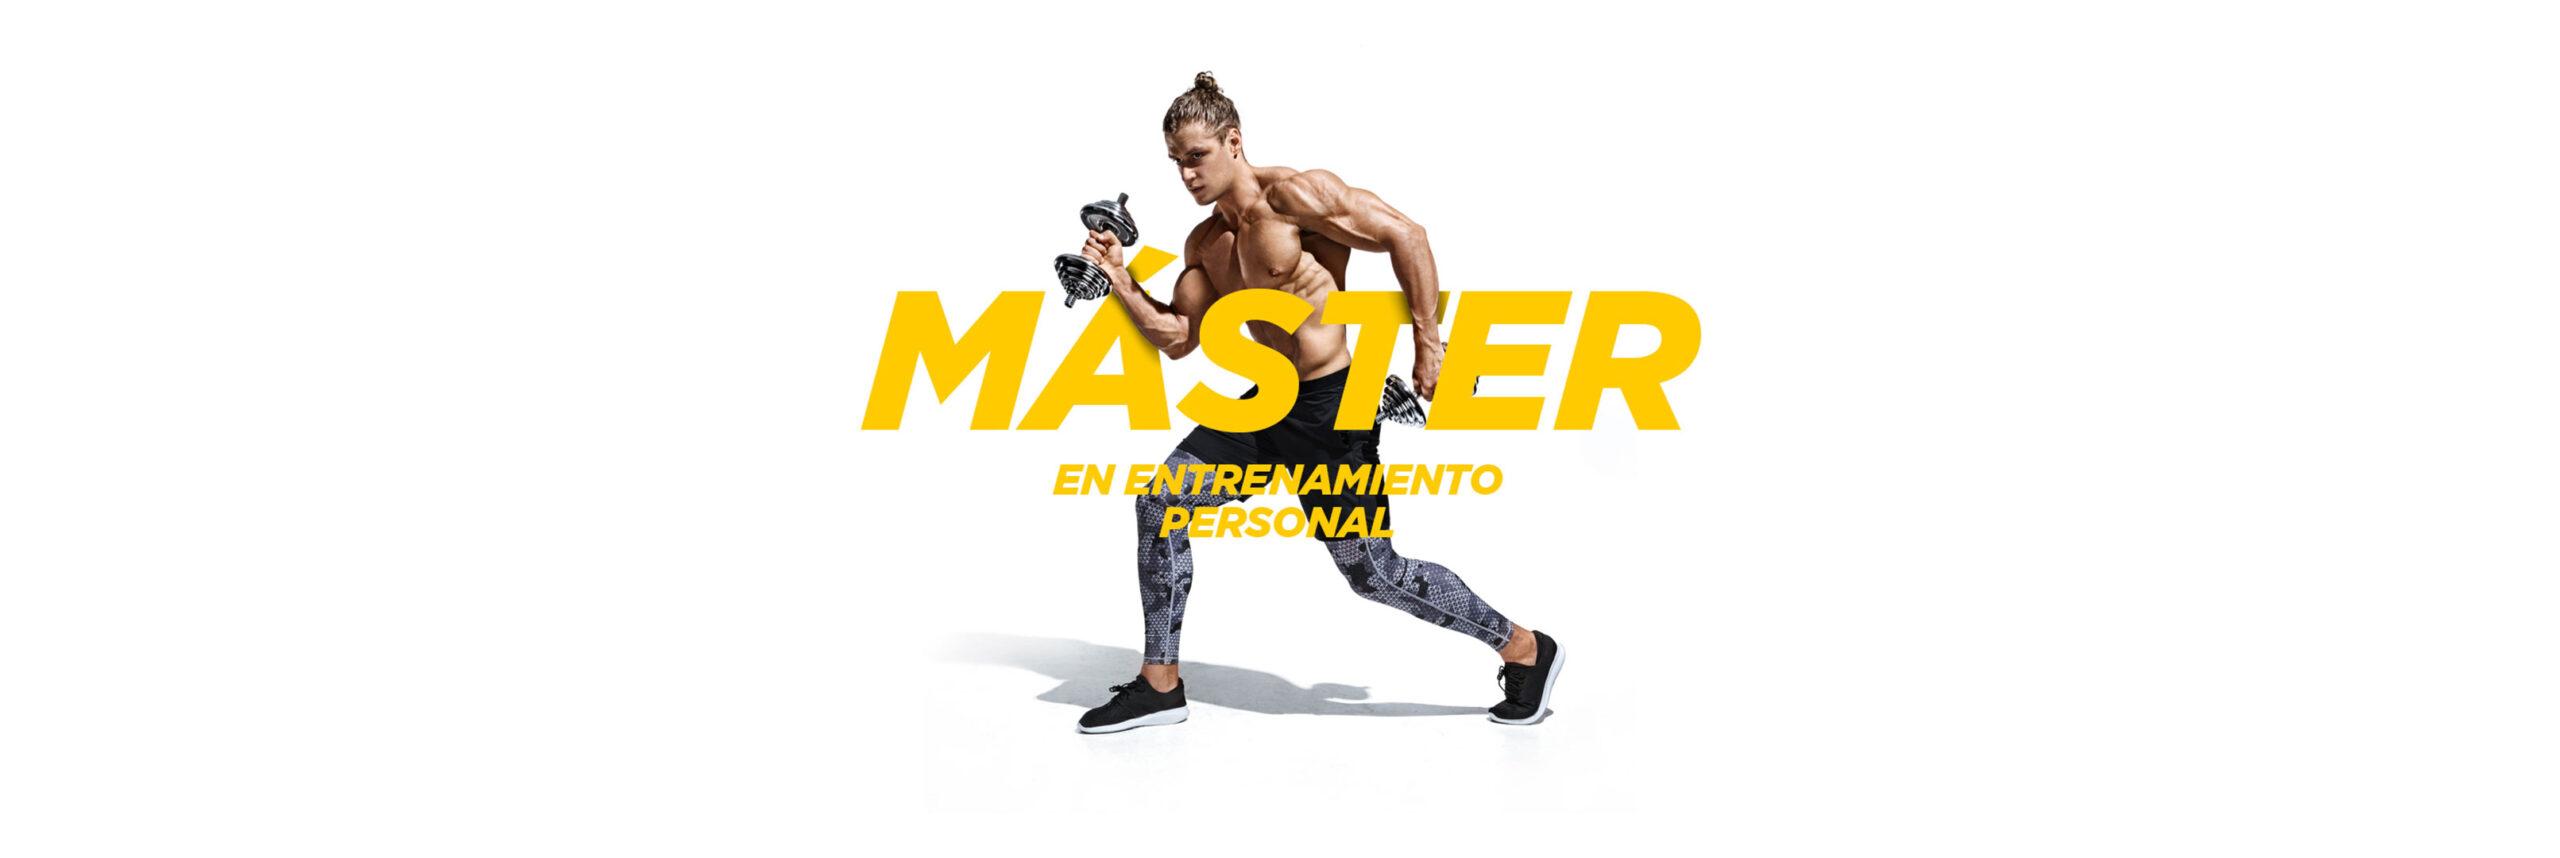 Master-pt-2